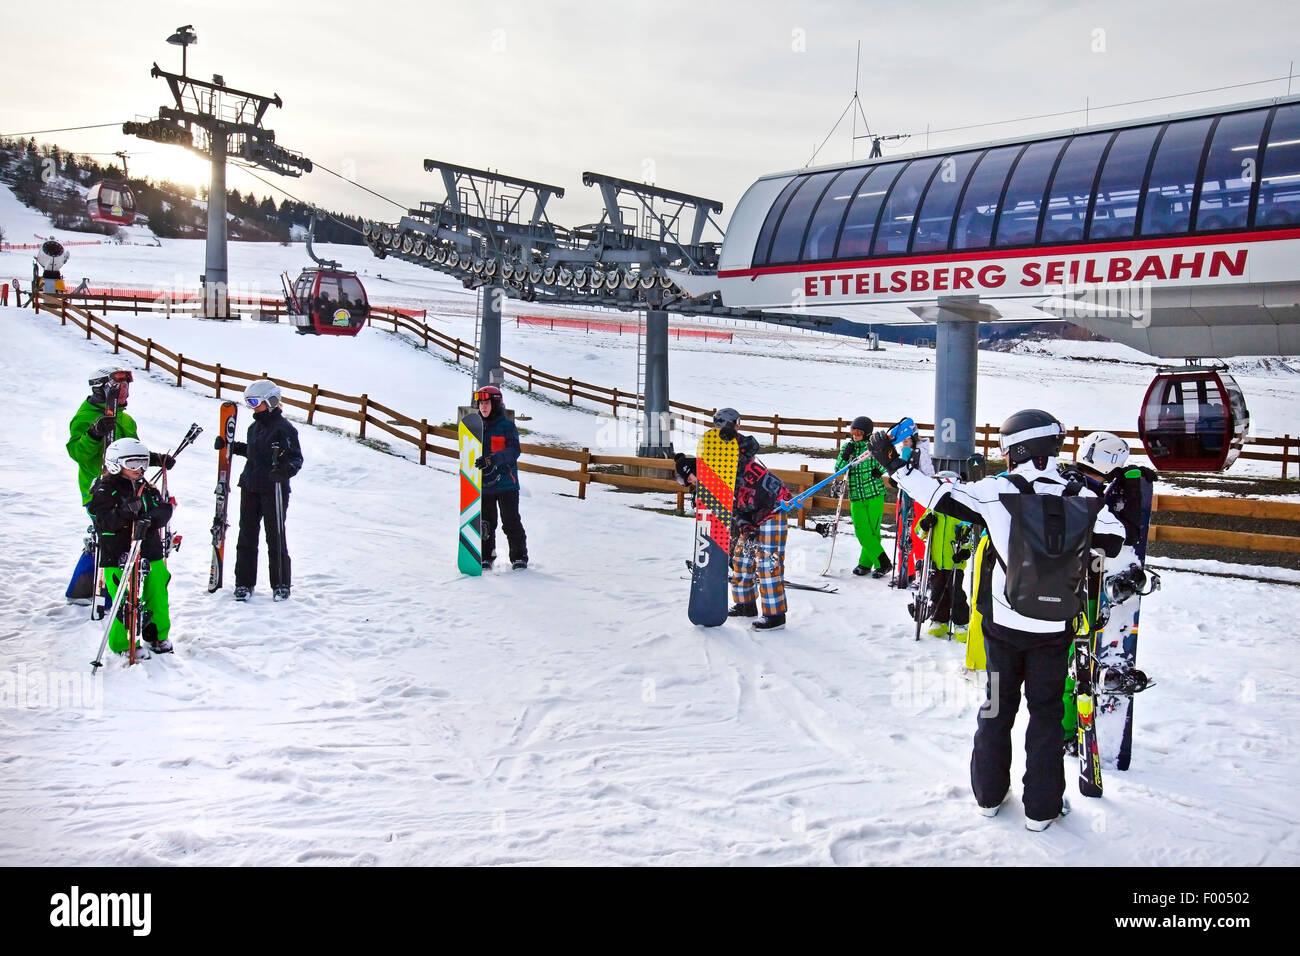 willingen ski stock photos & willingen ski stock images - alamy